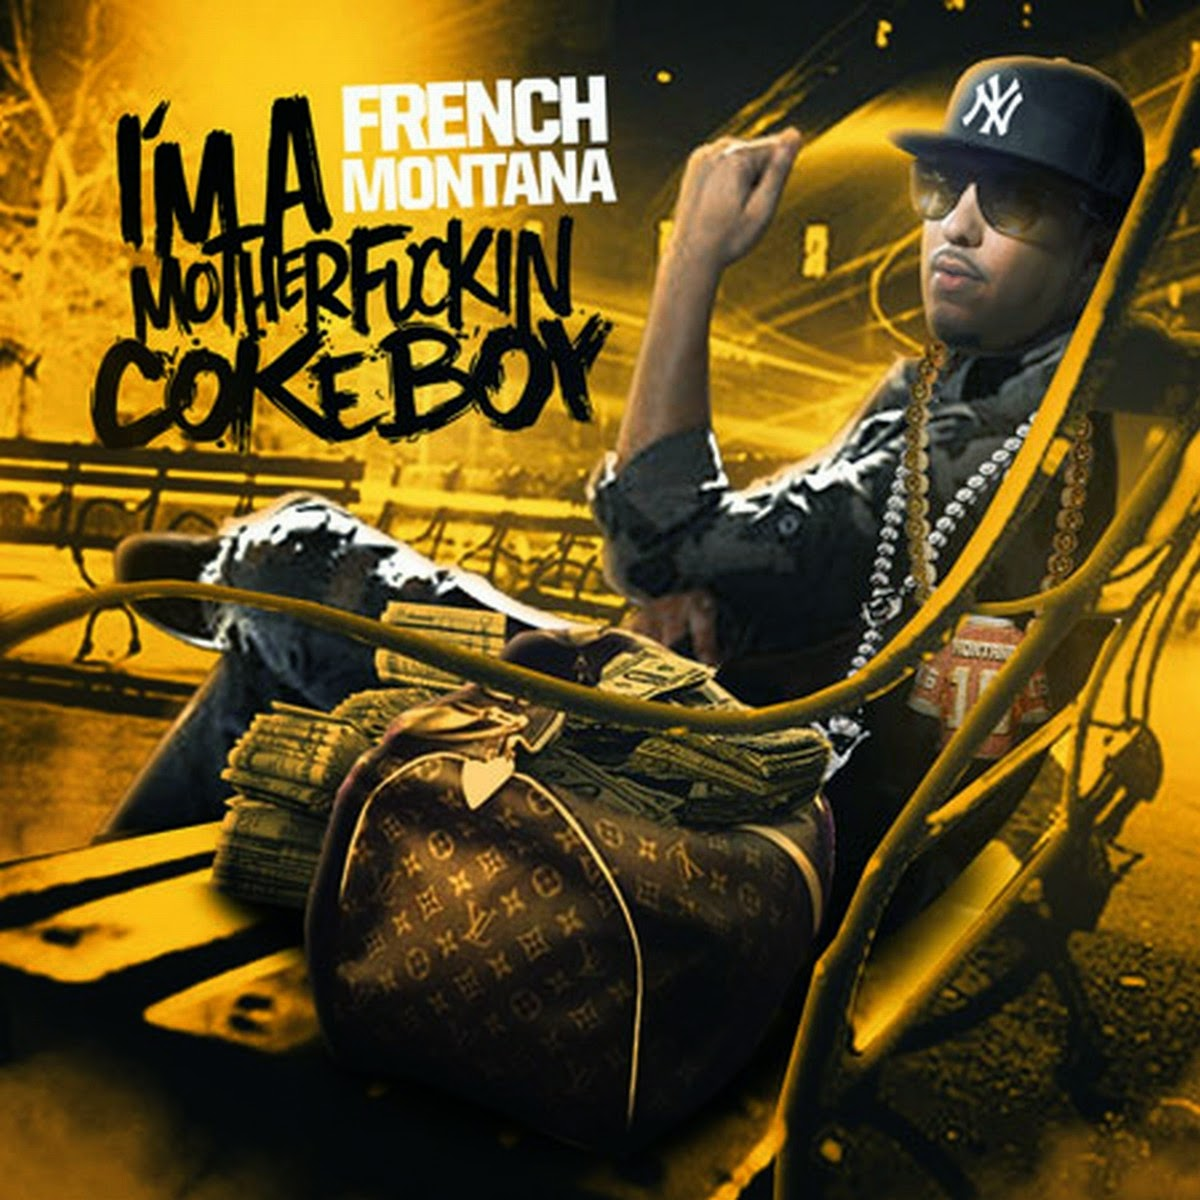 French Montana - I'm a Motherfckin' Coke Boy Cover